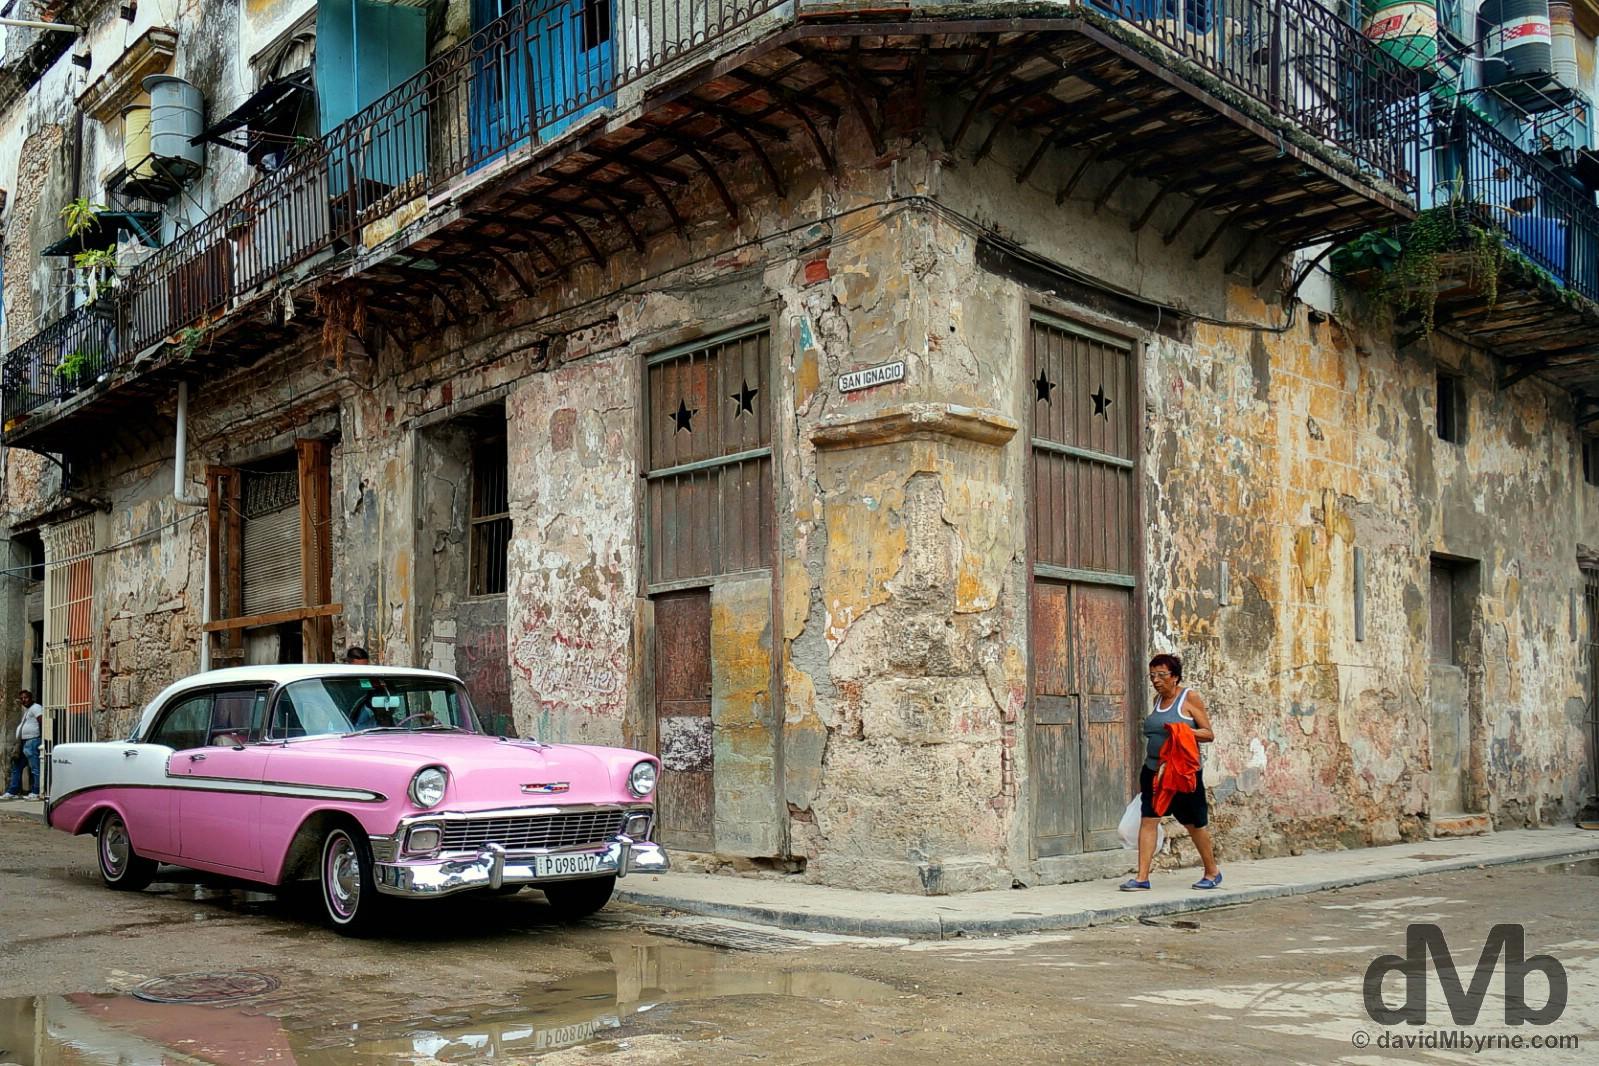 Over half a century of neglect. San Ignacio, Habana Vieja/Old Havana, Havana, Cuba. April 30, 2015.